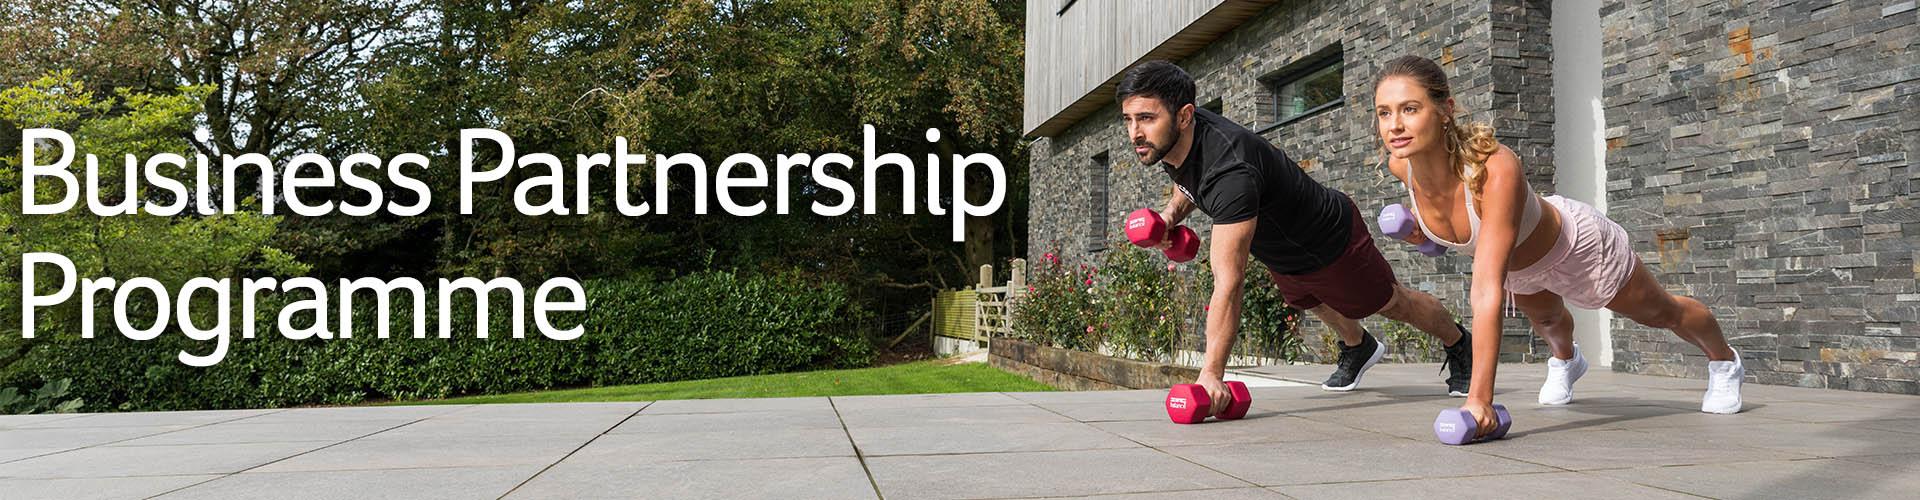 Business_Partnership_Programme_Banner